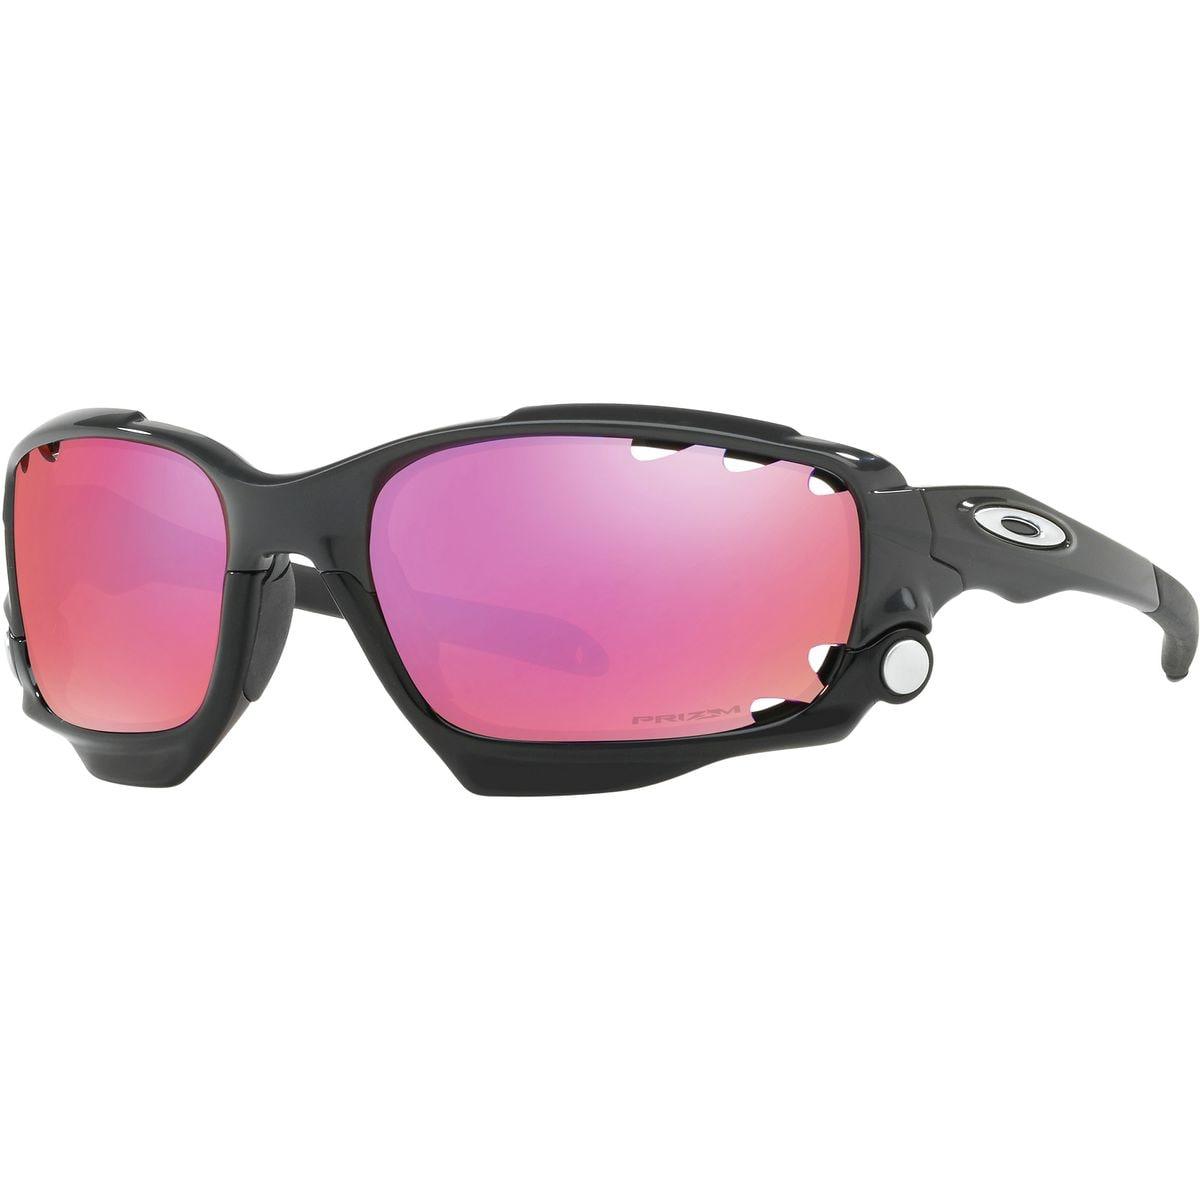 Oakley Racing Jacket Prizm Sunglasses - Men's